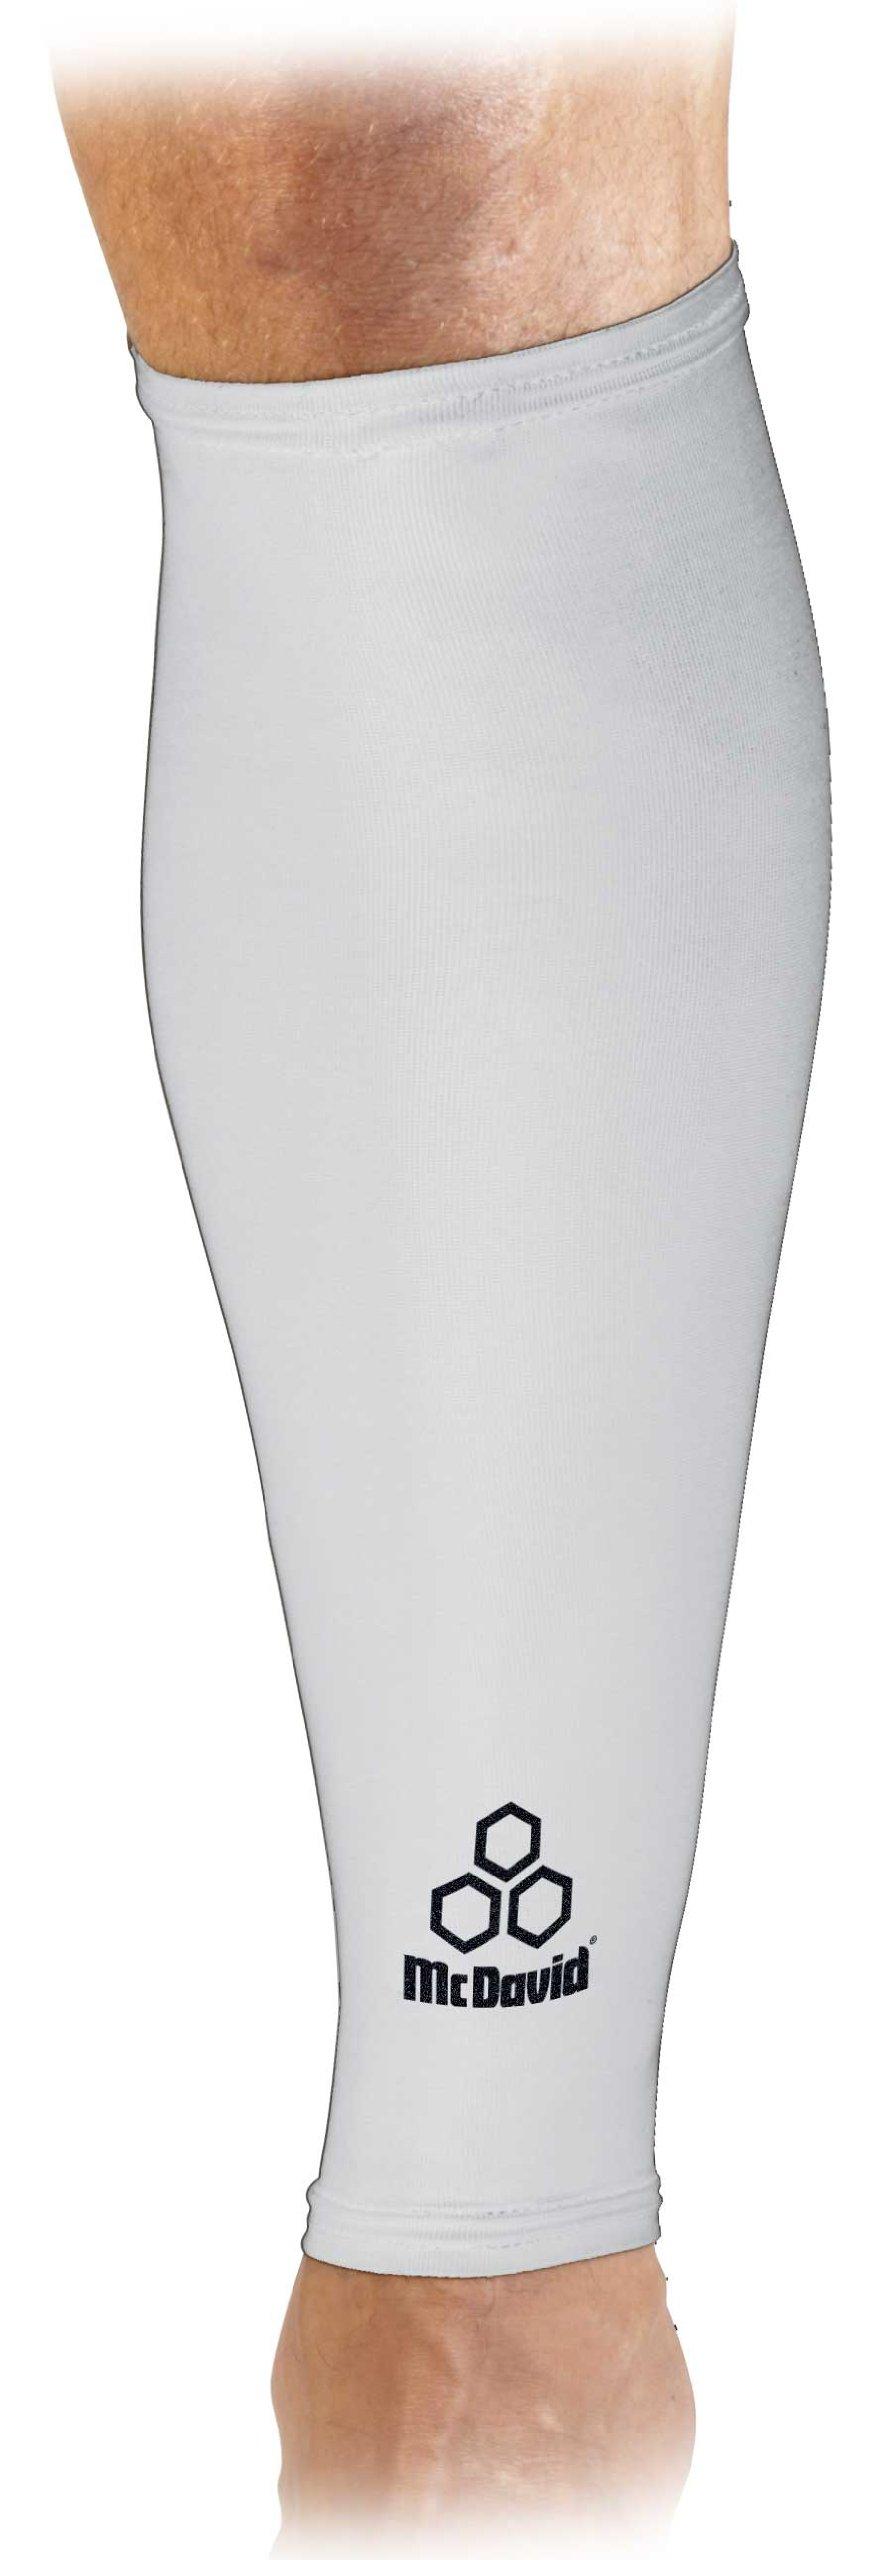 McDavid 6577 True Compression Calf Sleeve (White, Medium) by McDavid